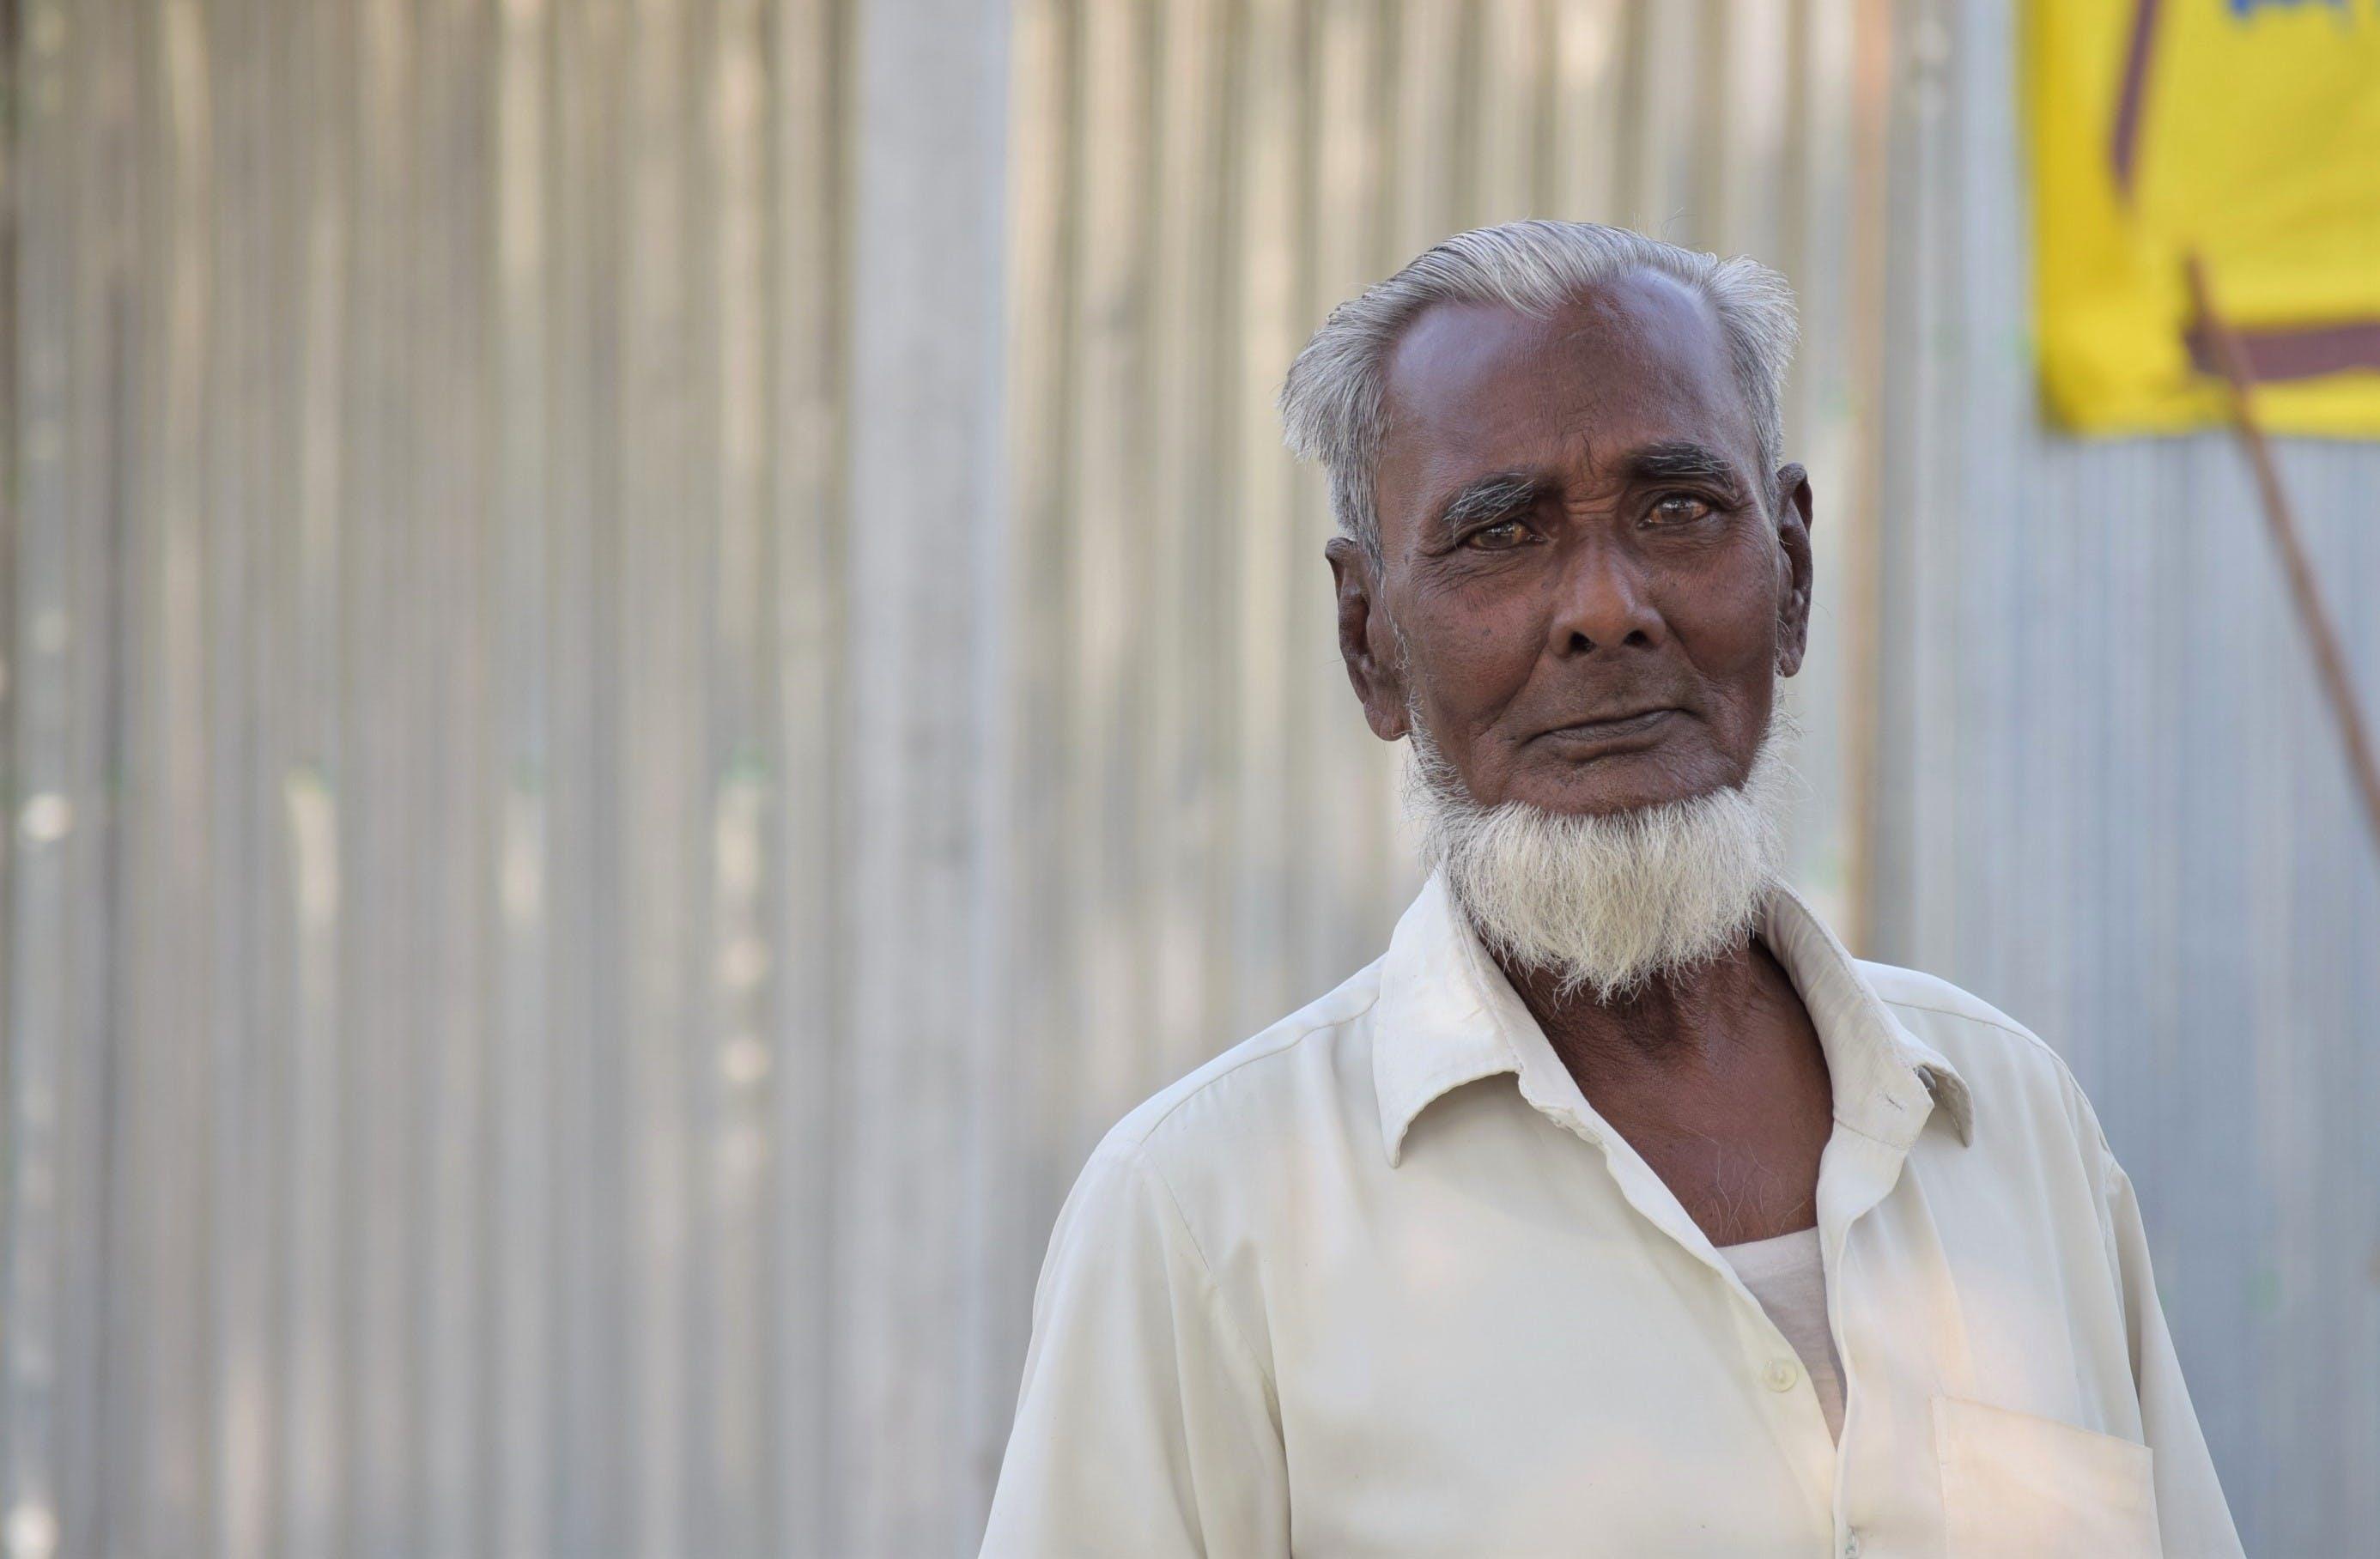 Fotos de stock gratuitas de anciano, cabello, hombre, persona